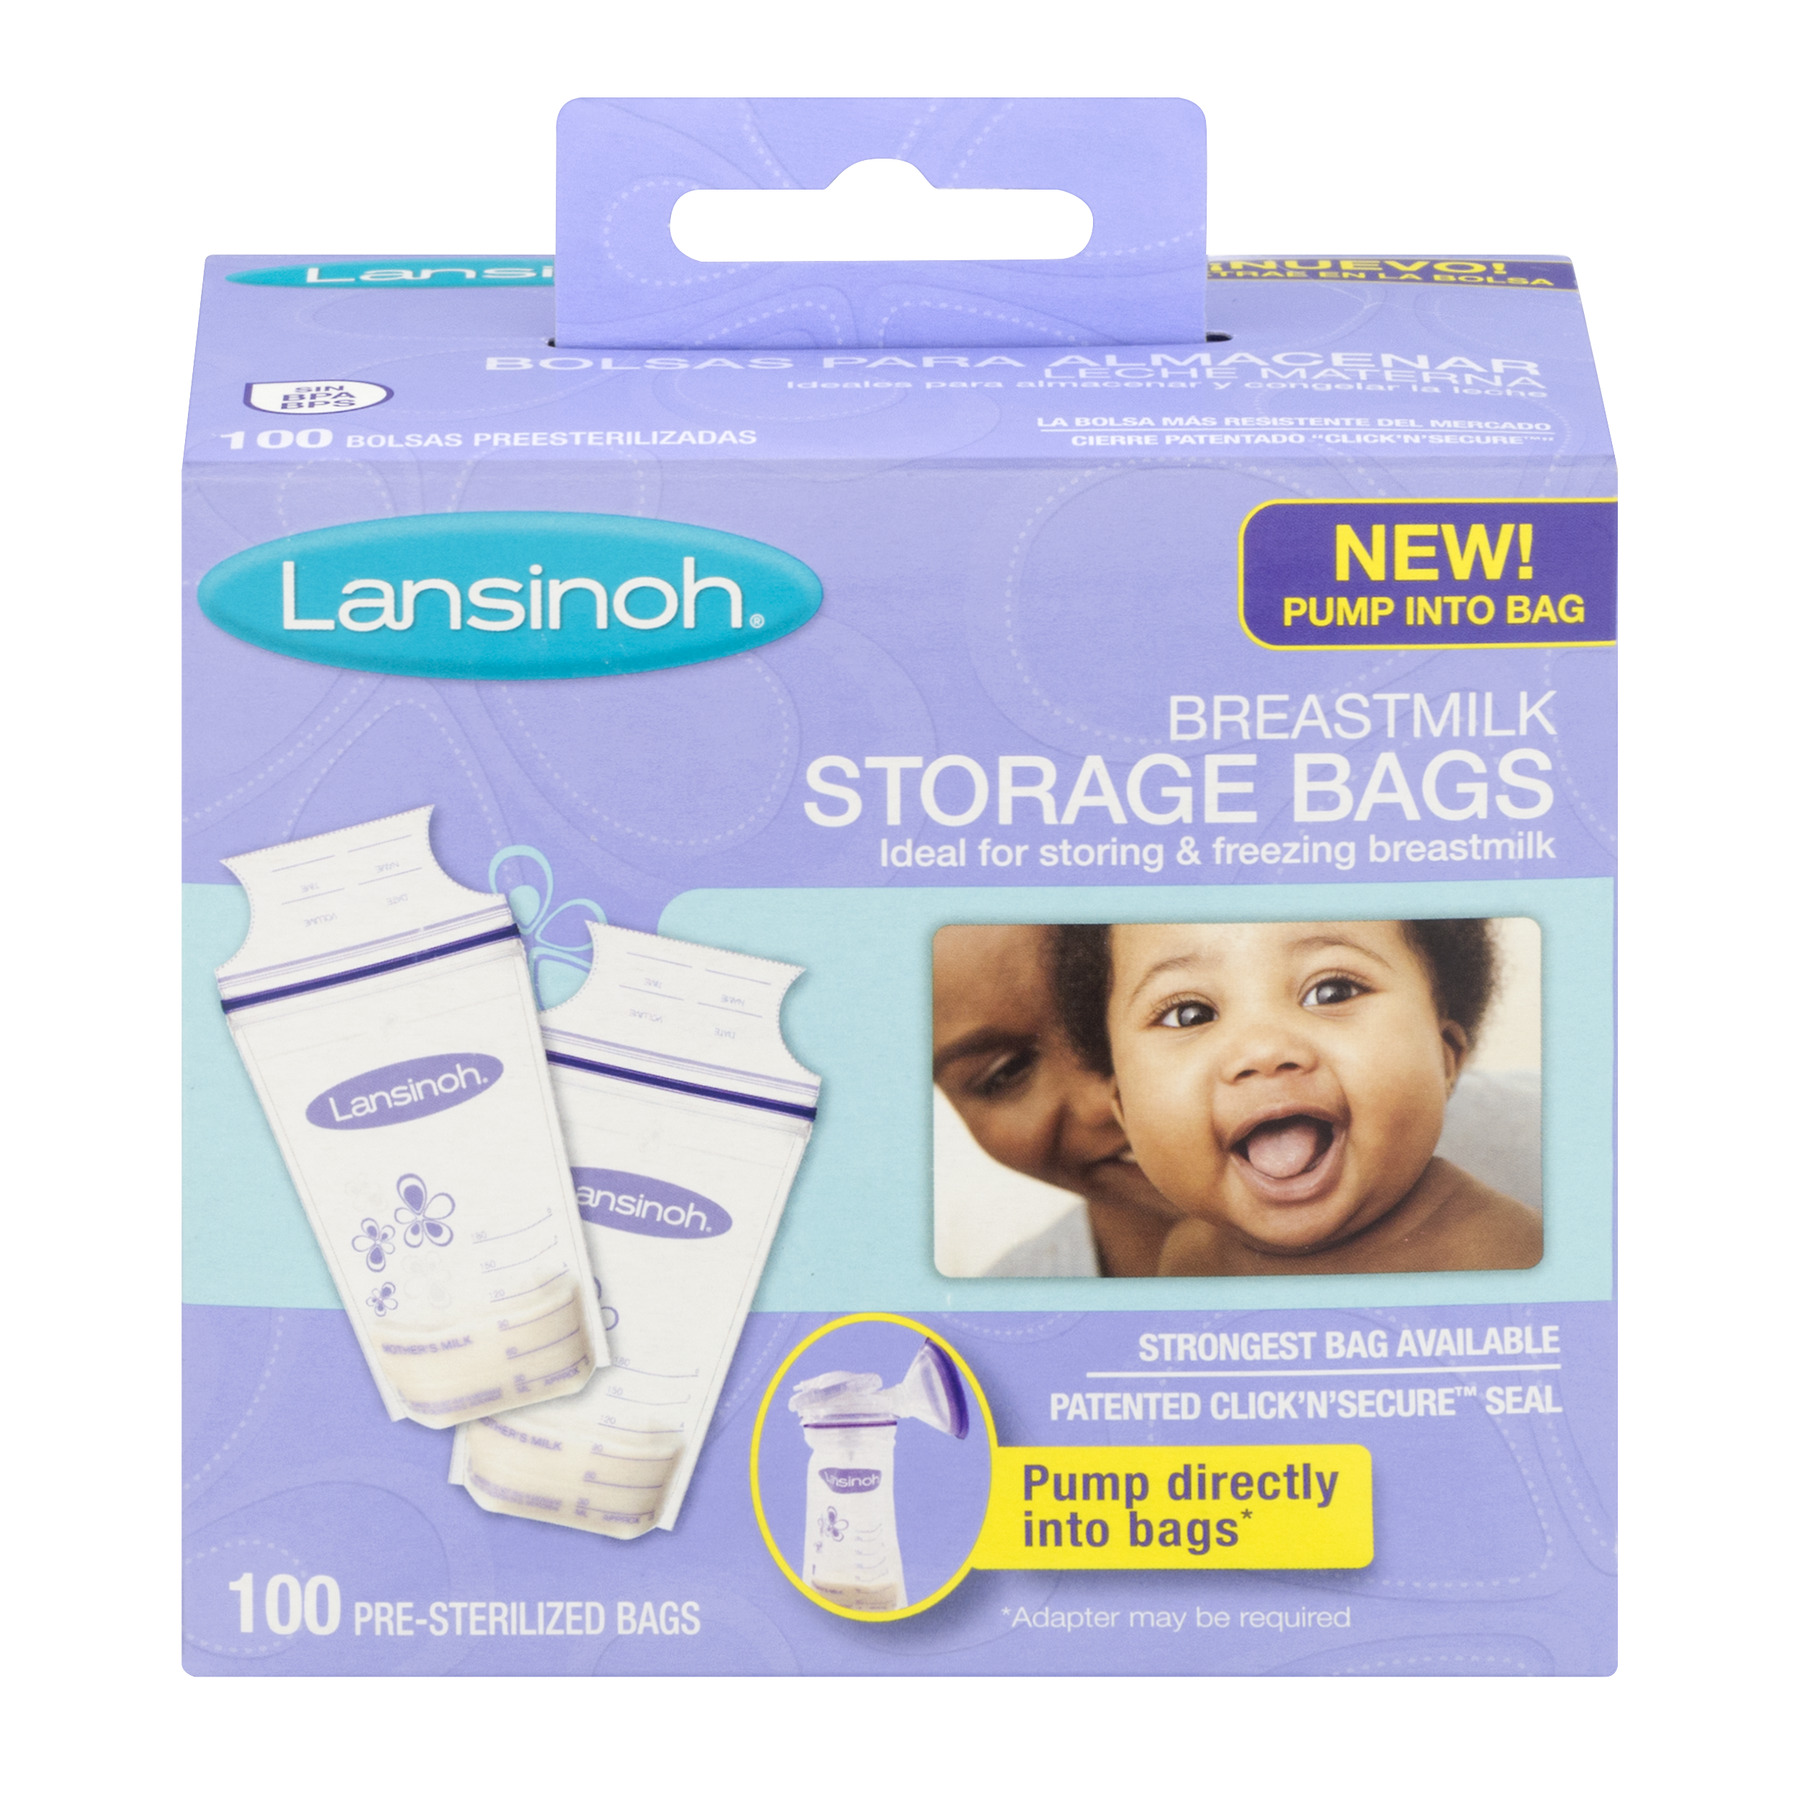 Lansinoh Breastmilk Storage Bags, 100 Count convenient milk storage bags for breastfeeding